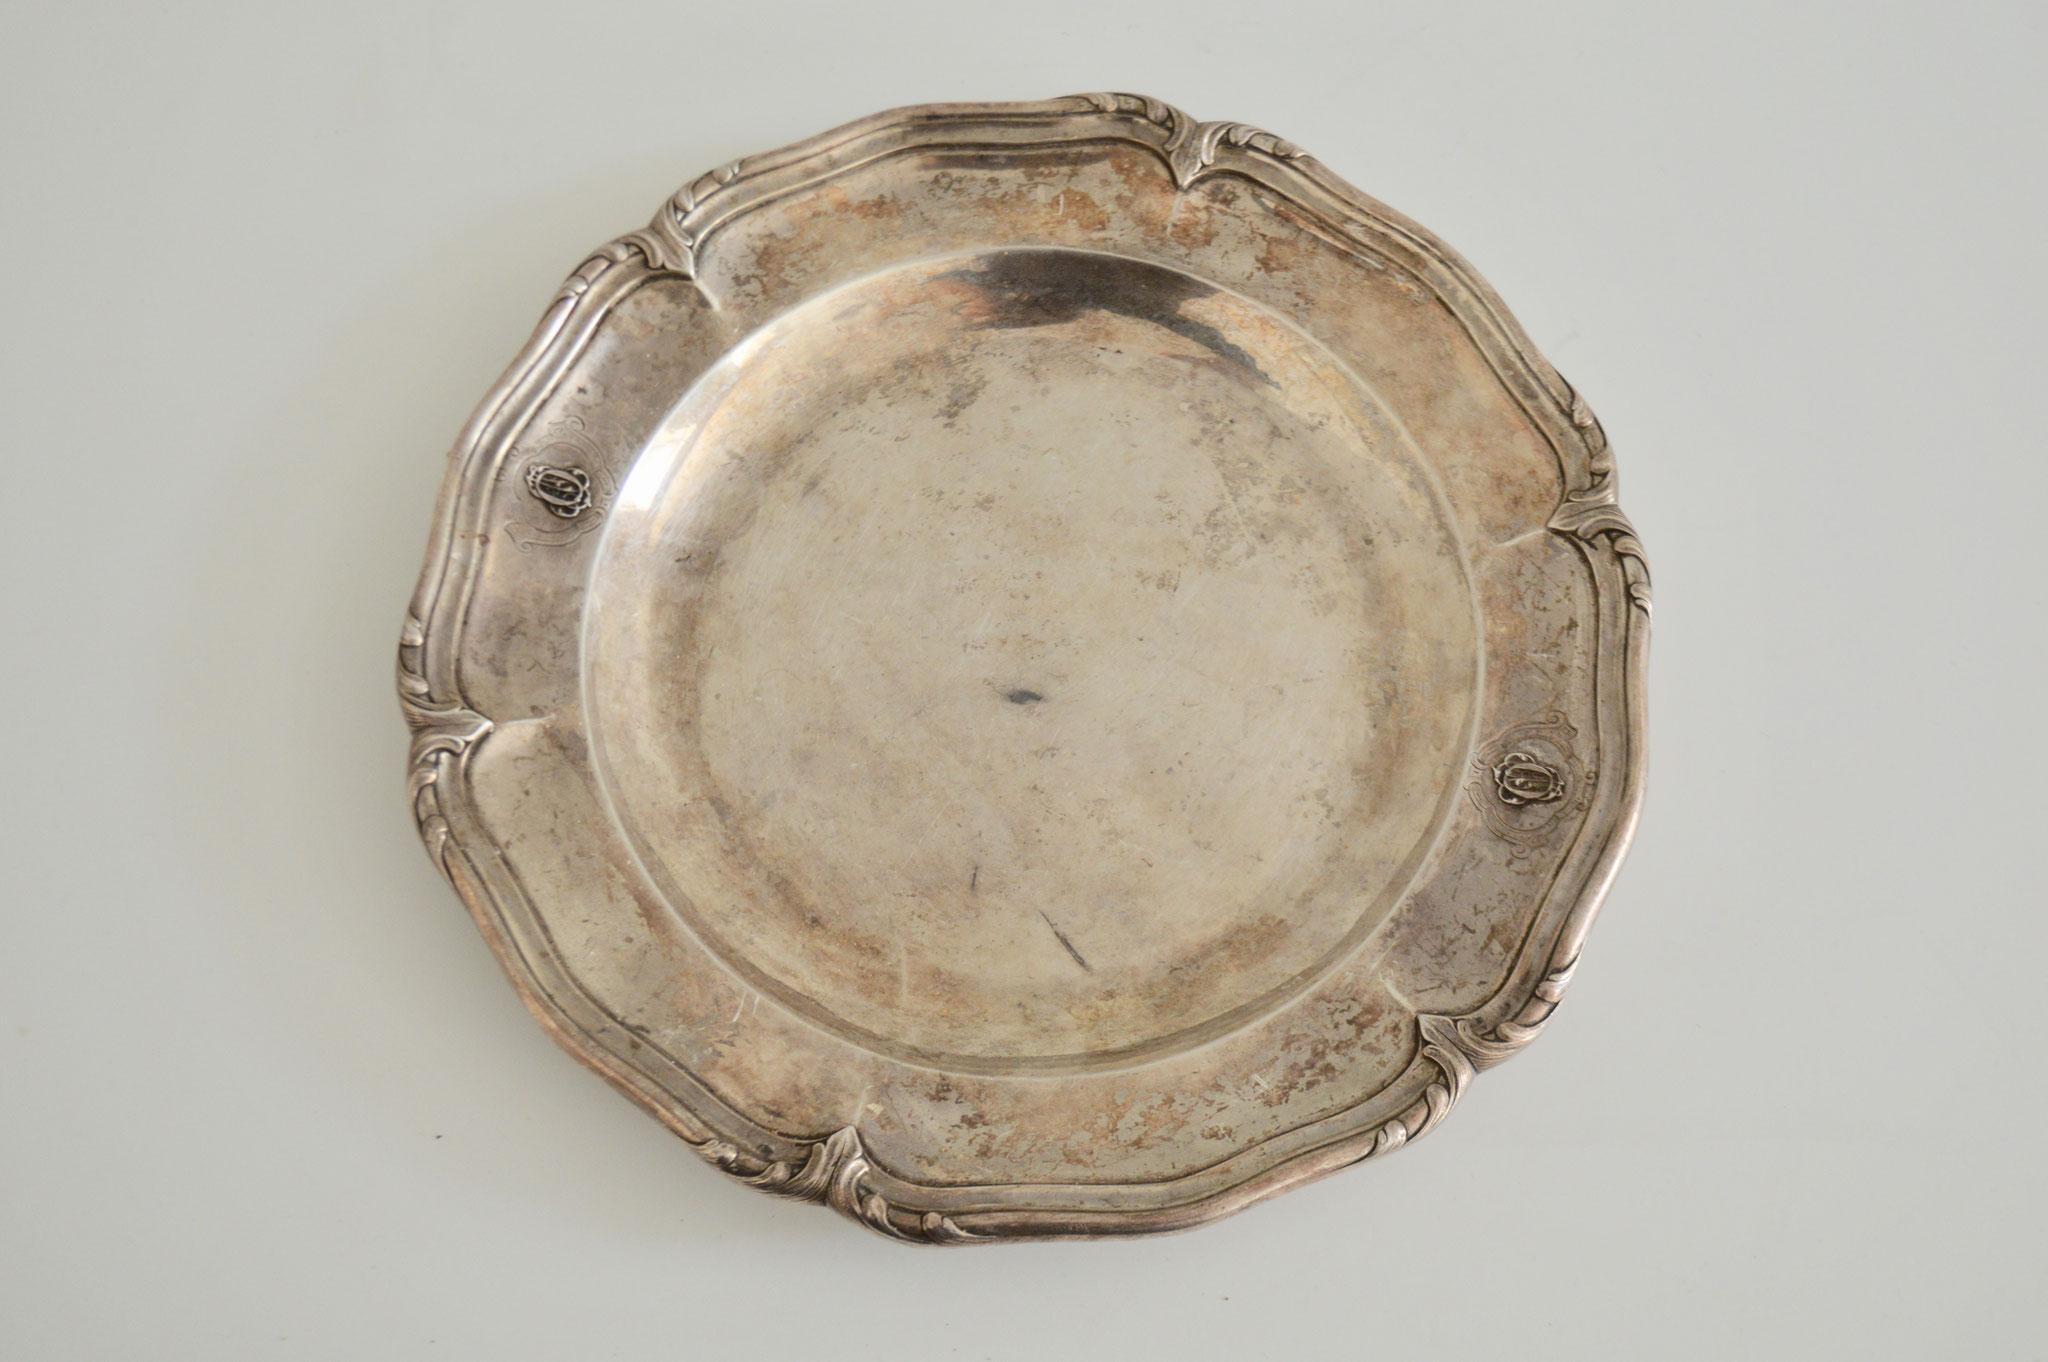 V) €4, Durchmesser ca. 29 cm